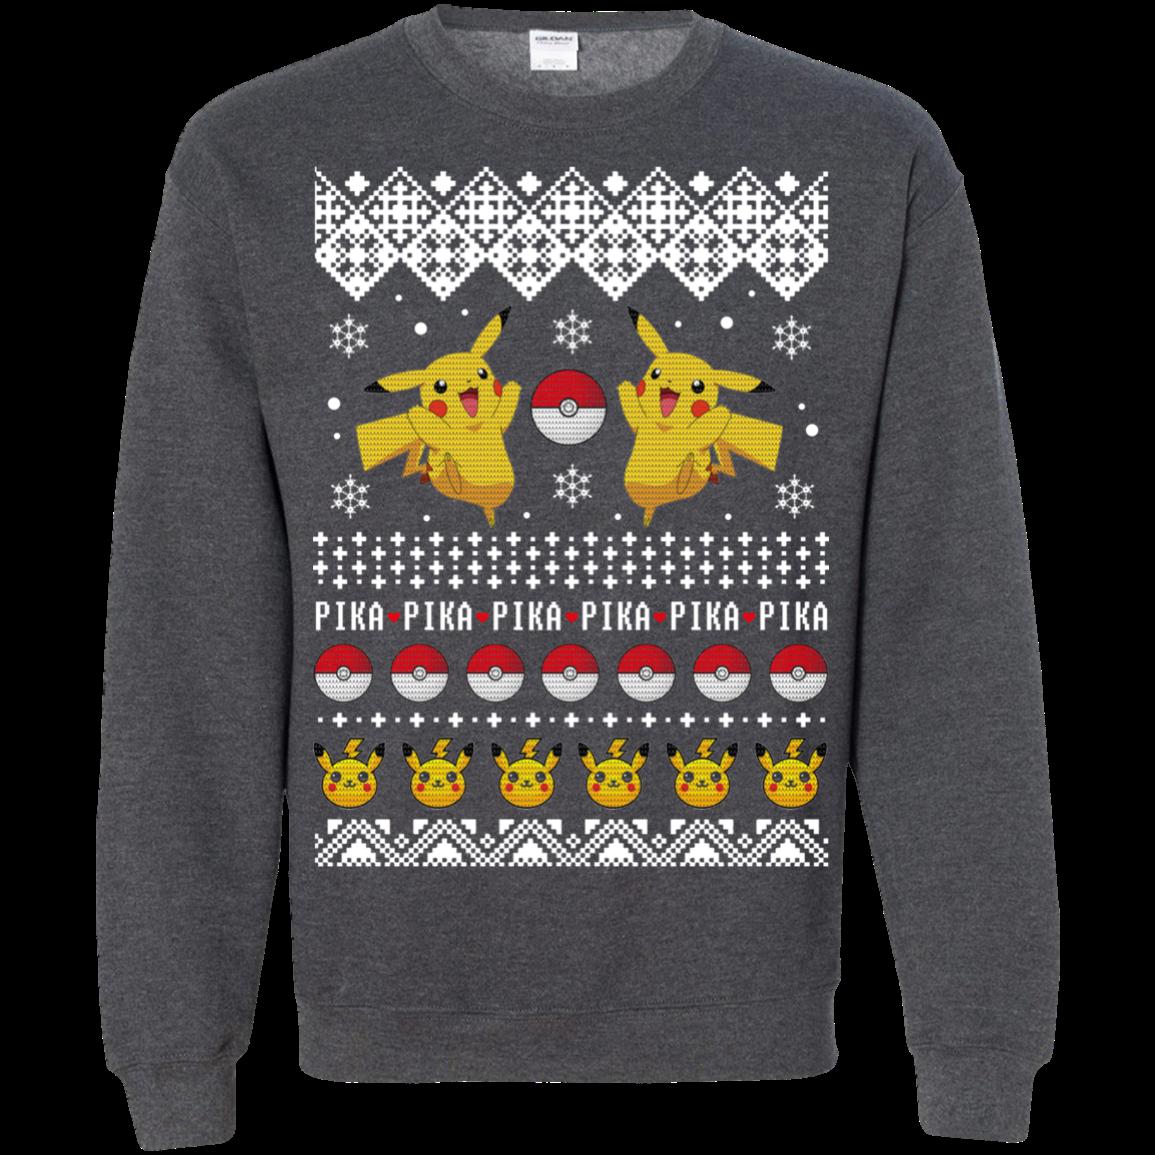 Pokemon Christmas Sweater.Pokemon Pikachu Pika Pika Christmas Sweater